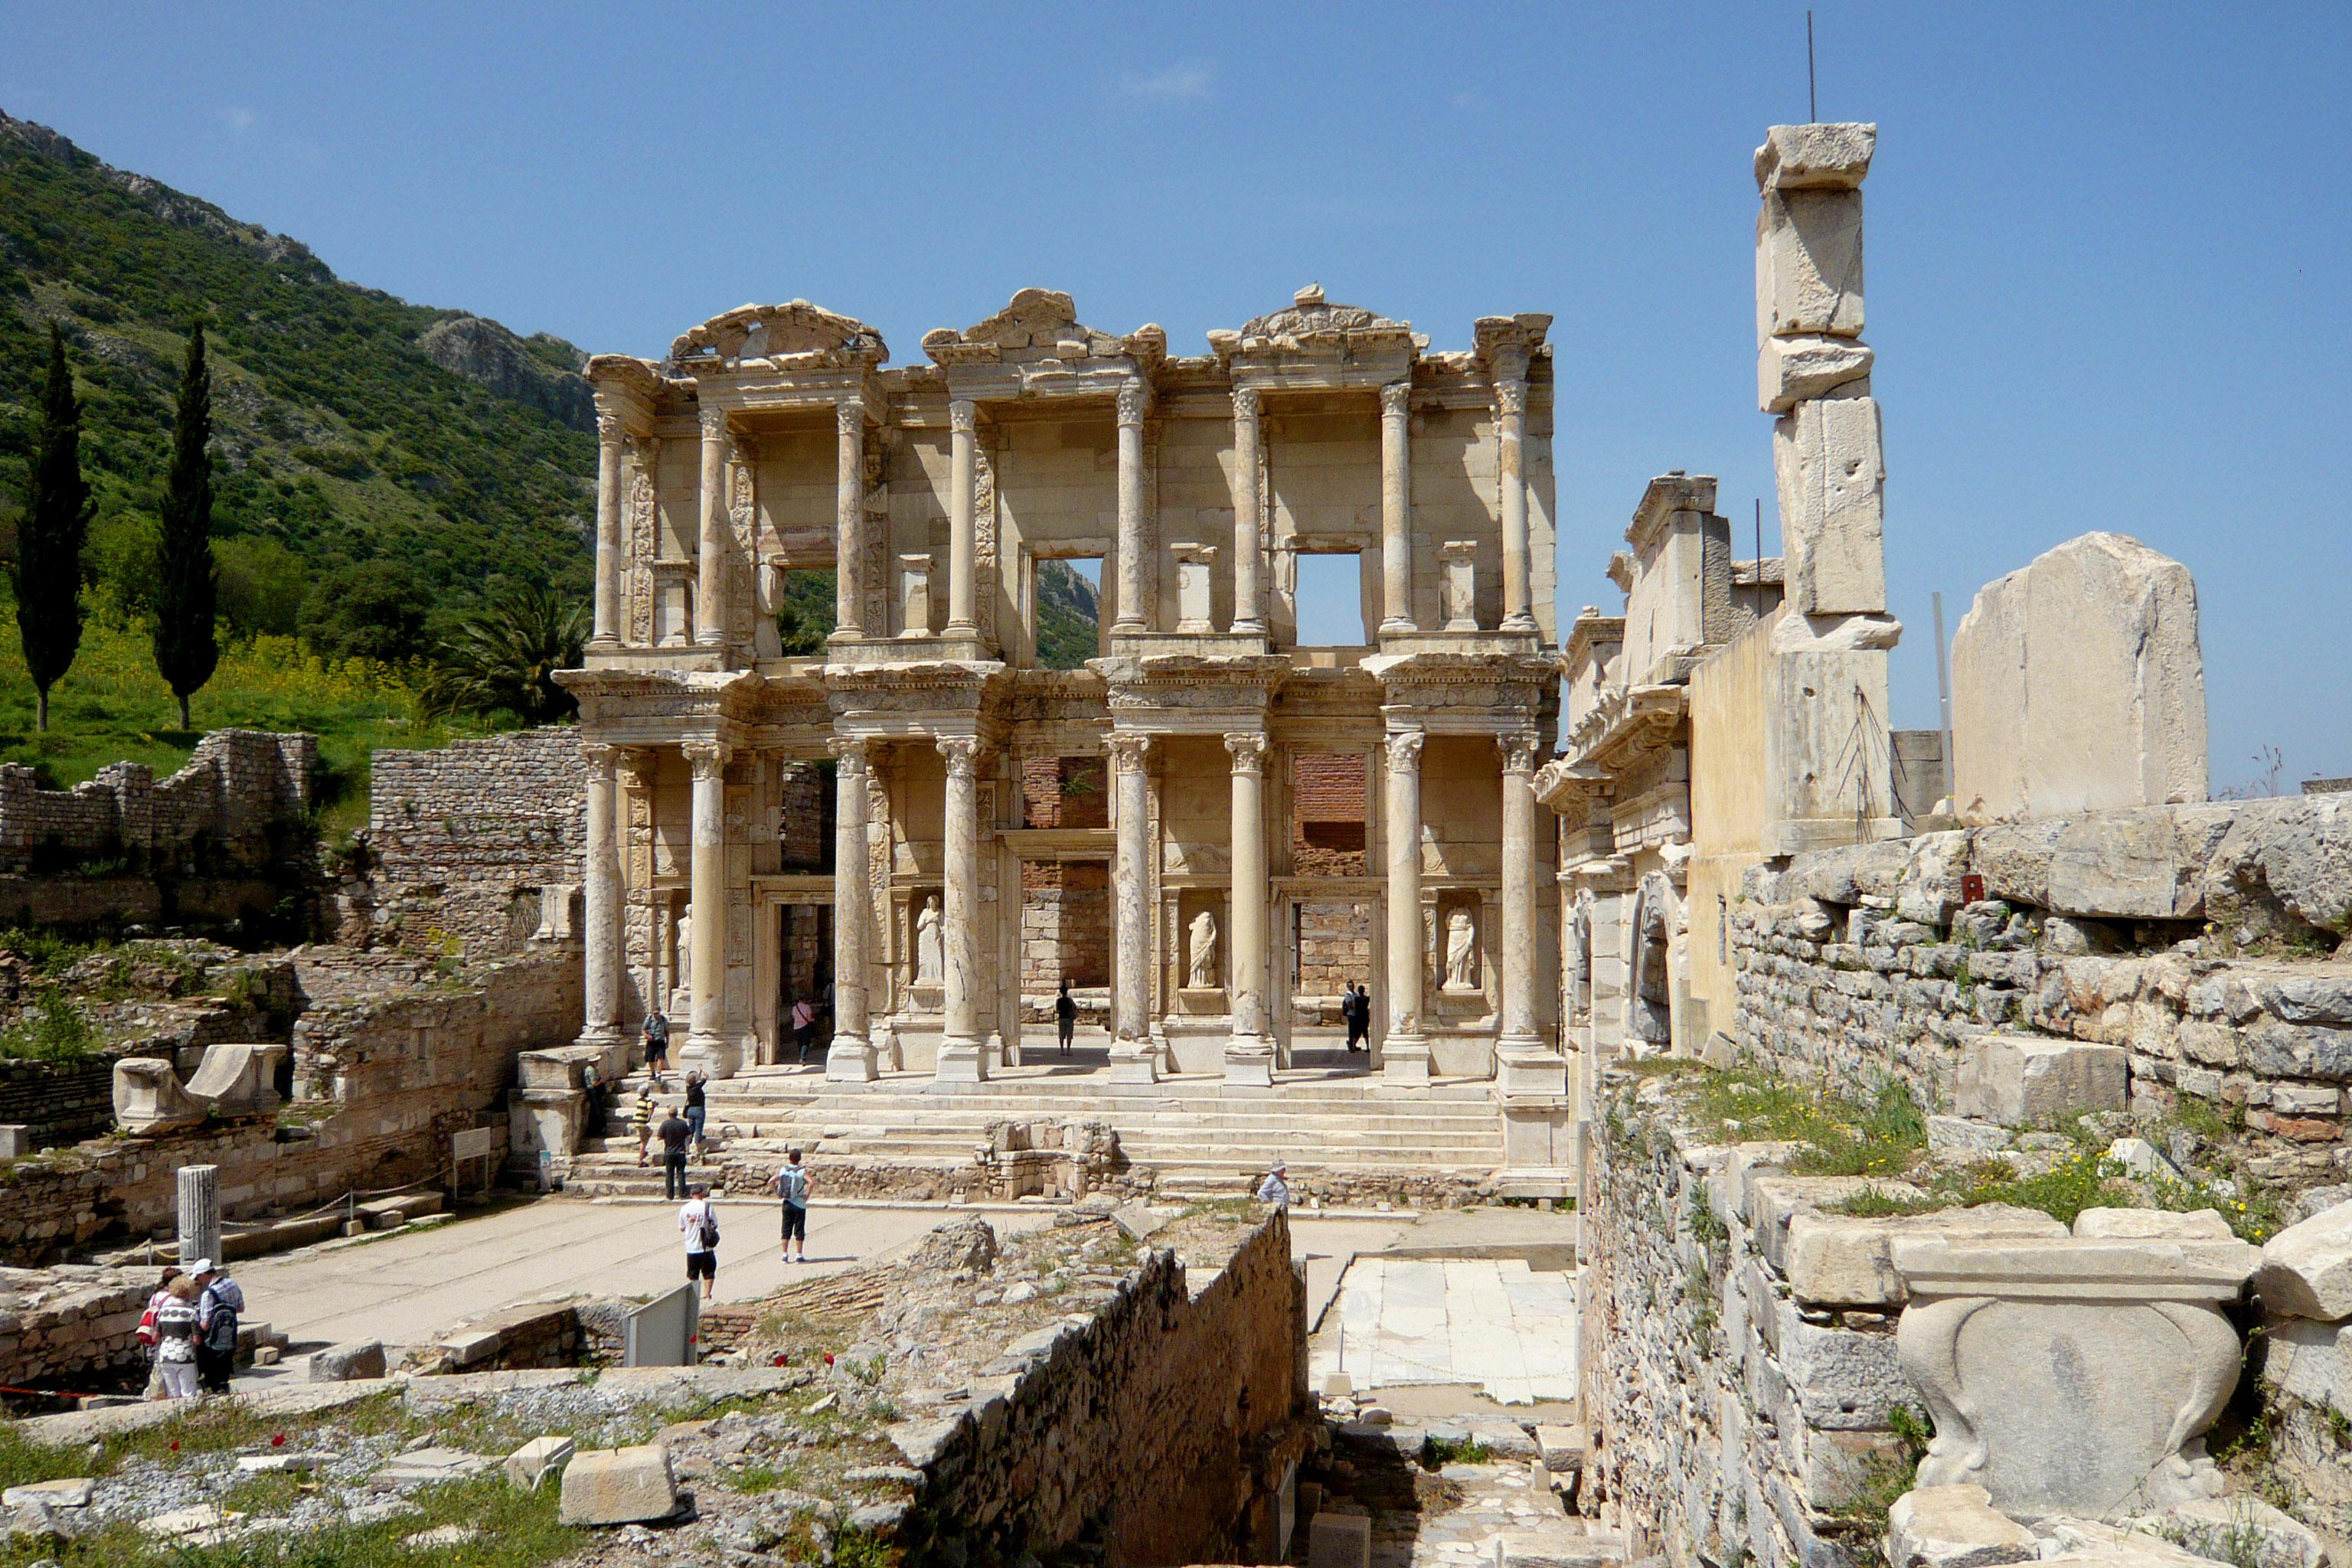 Library of Celcus, Ephesus